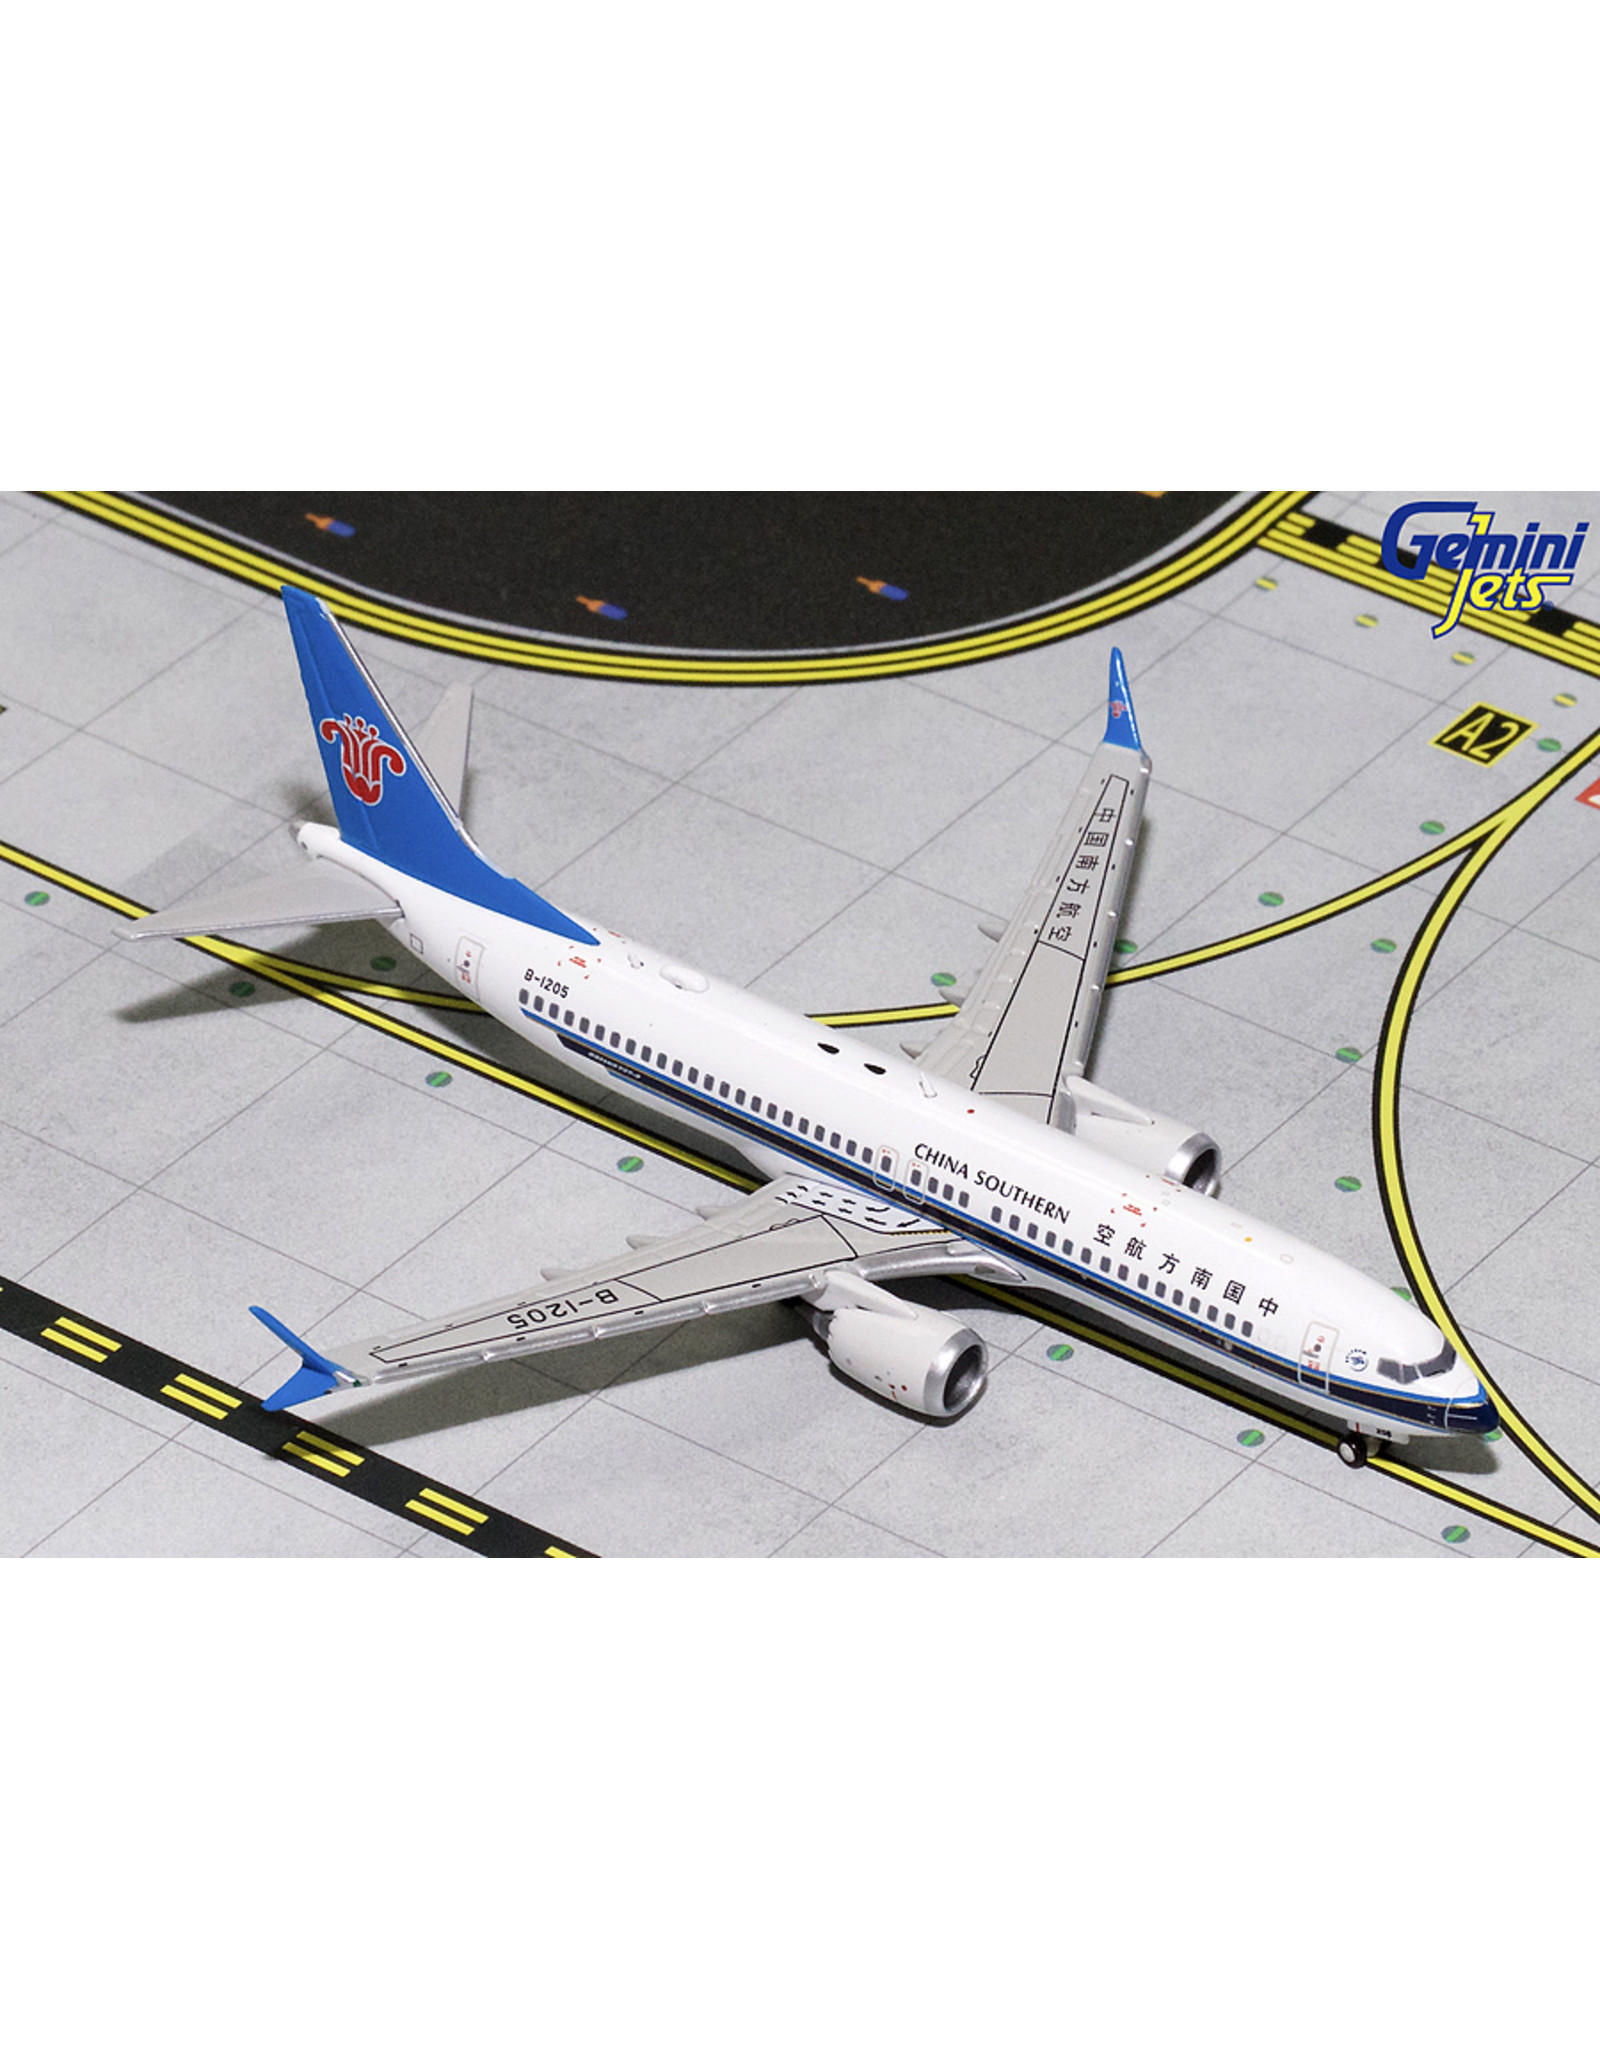 Gemini Gem4 China Southern 737max8 B-1205